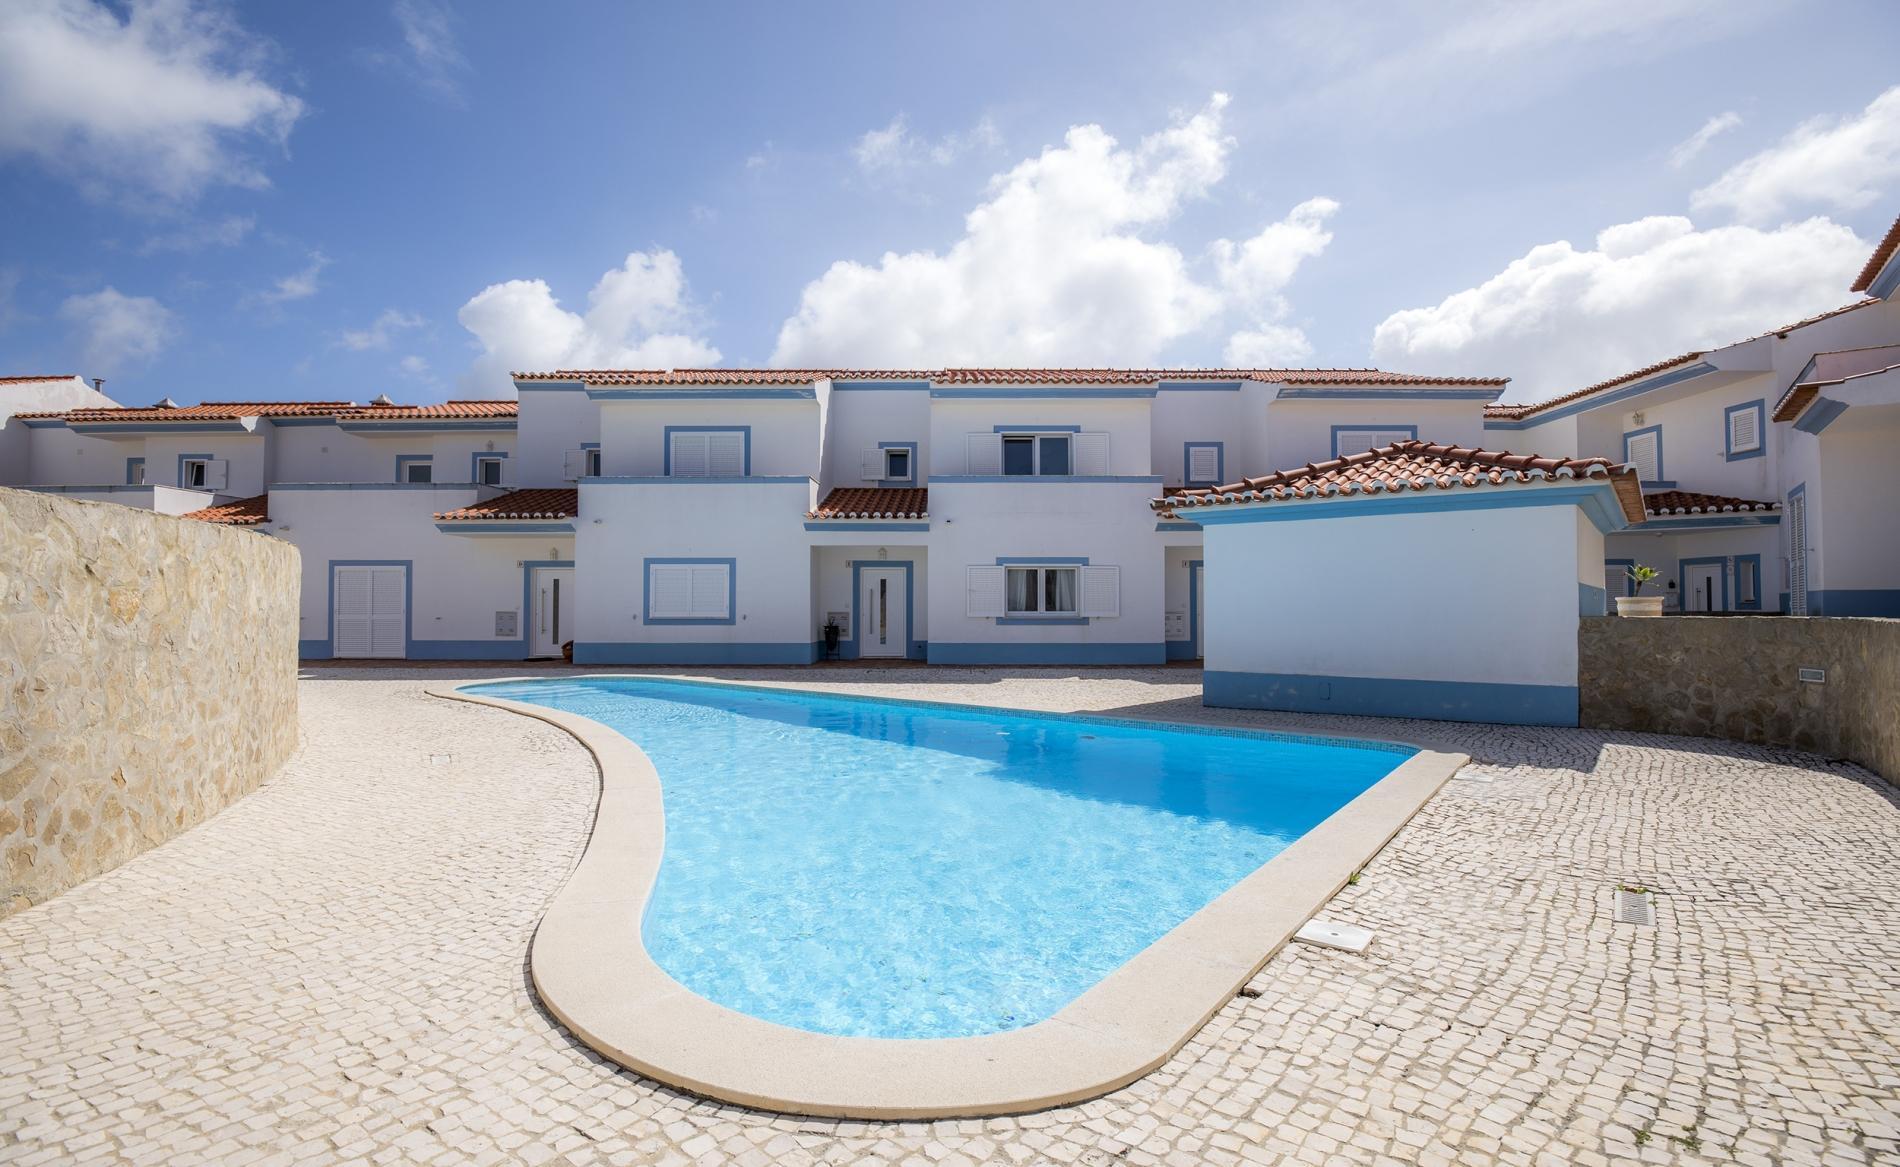 Apartment D01 - Beach   Riverside Townhouse photo 22521716